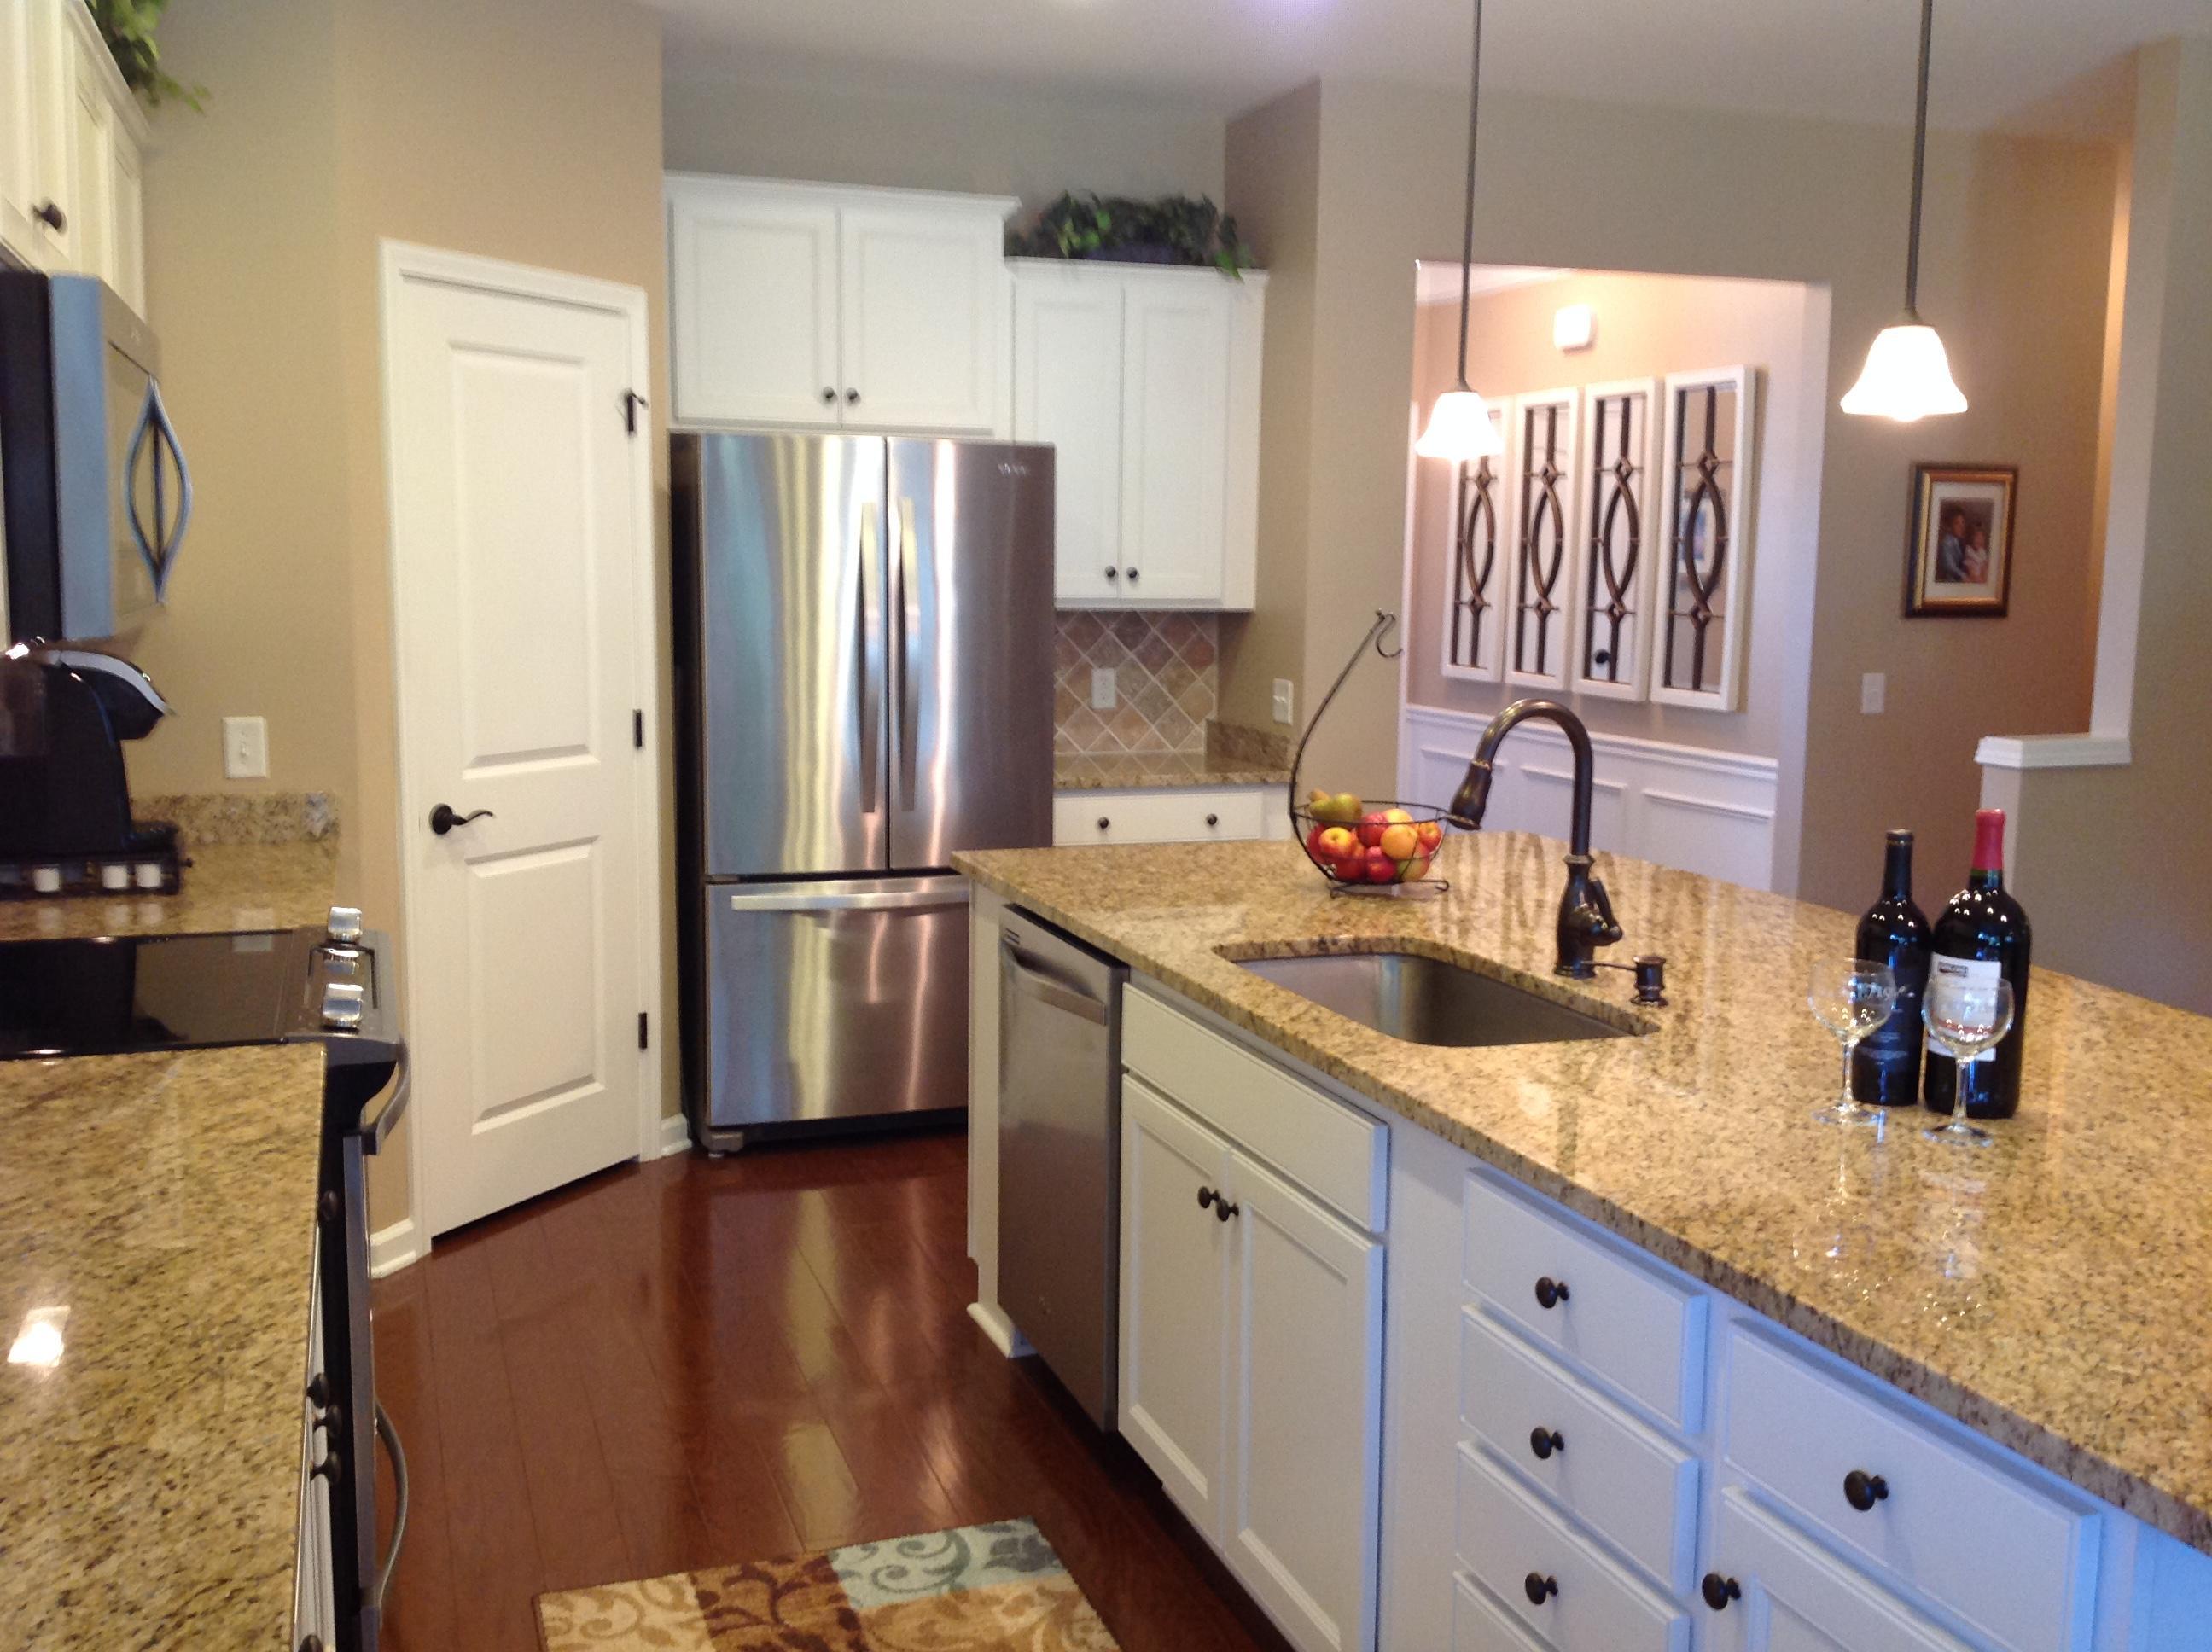 Cane Bay Plantation Homes For Sale - 547 Eastern Isle, Summerville, SC - 2